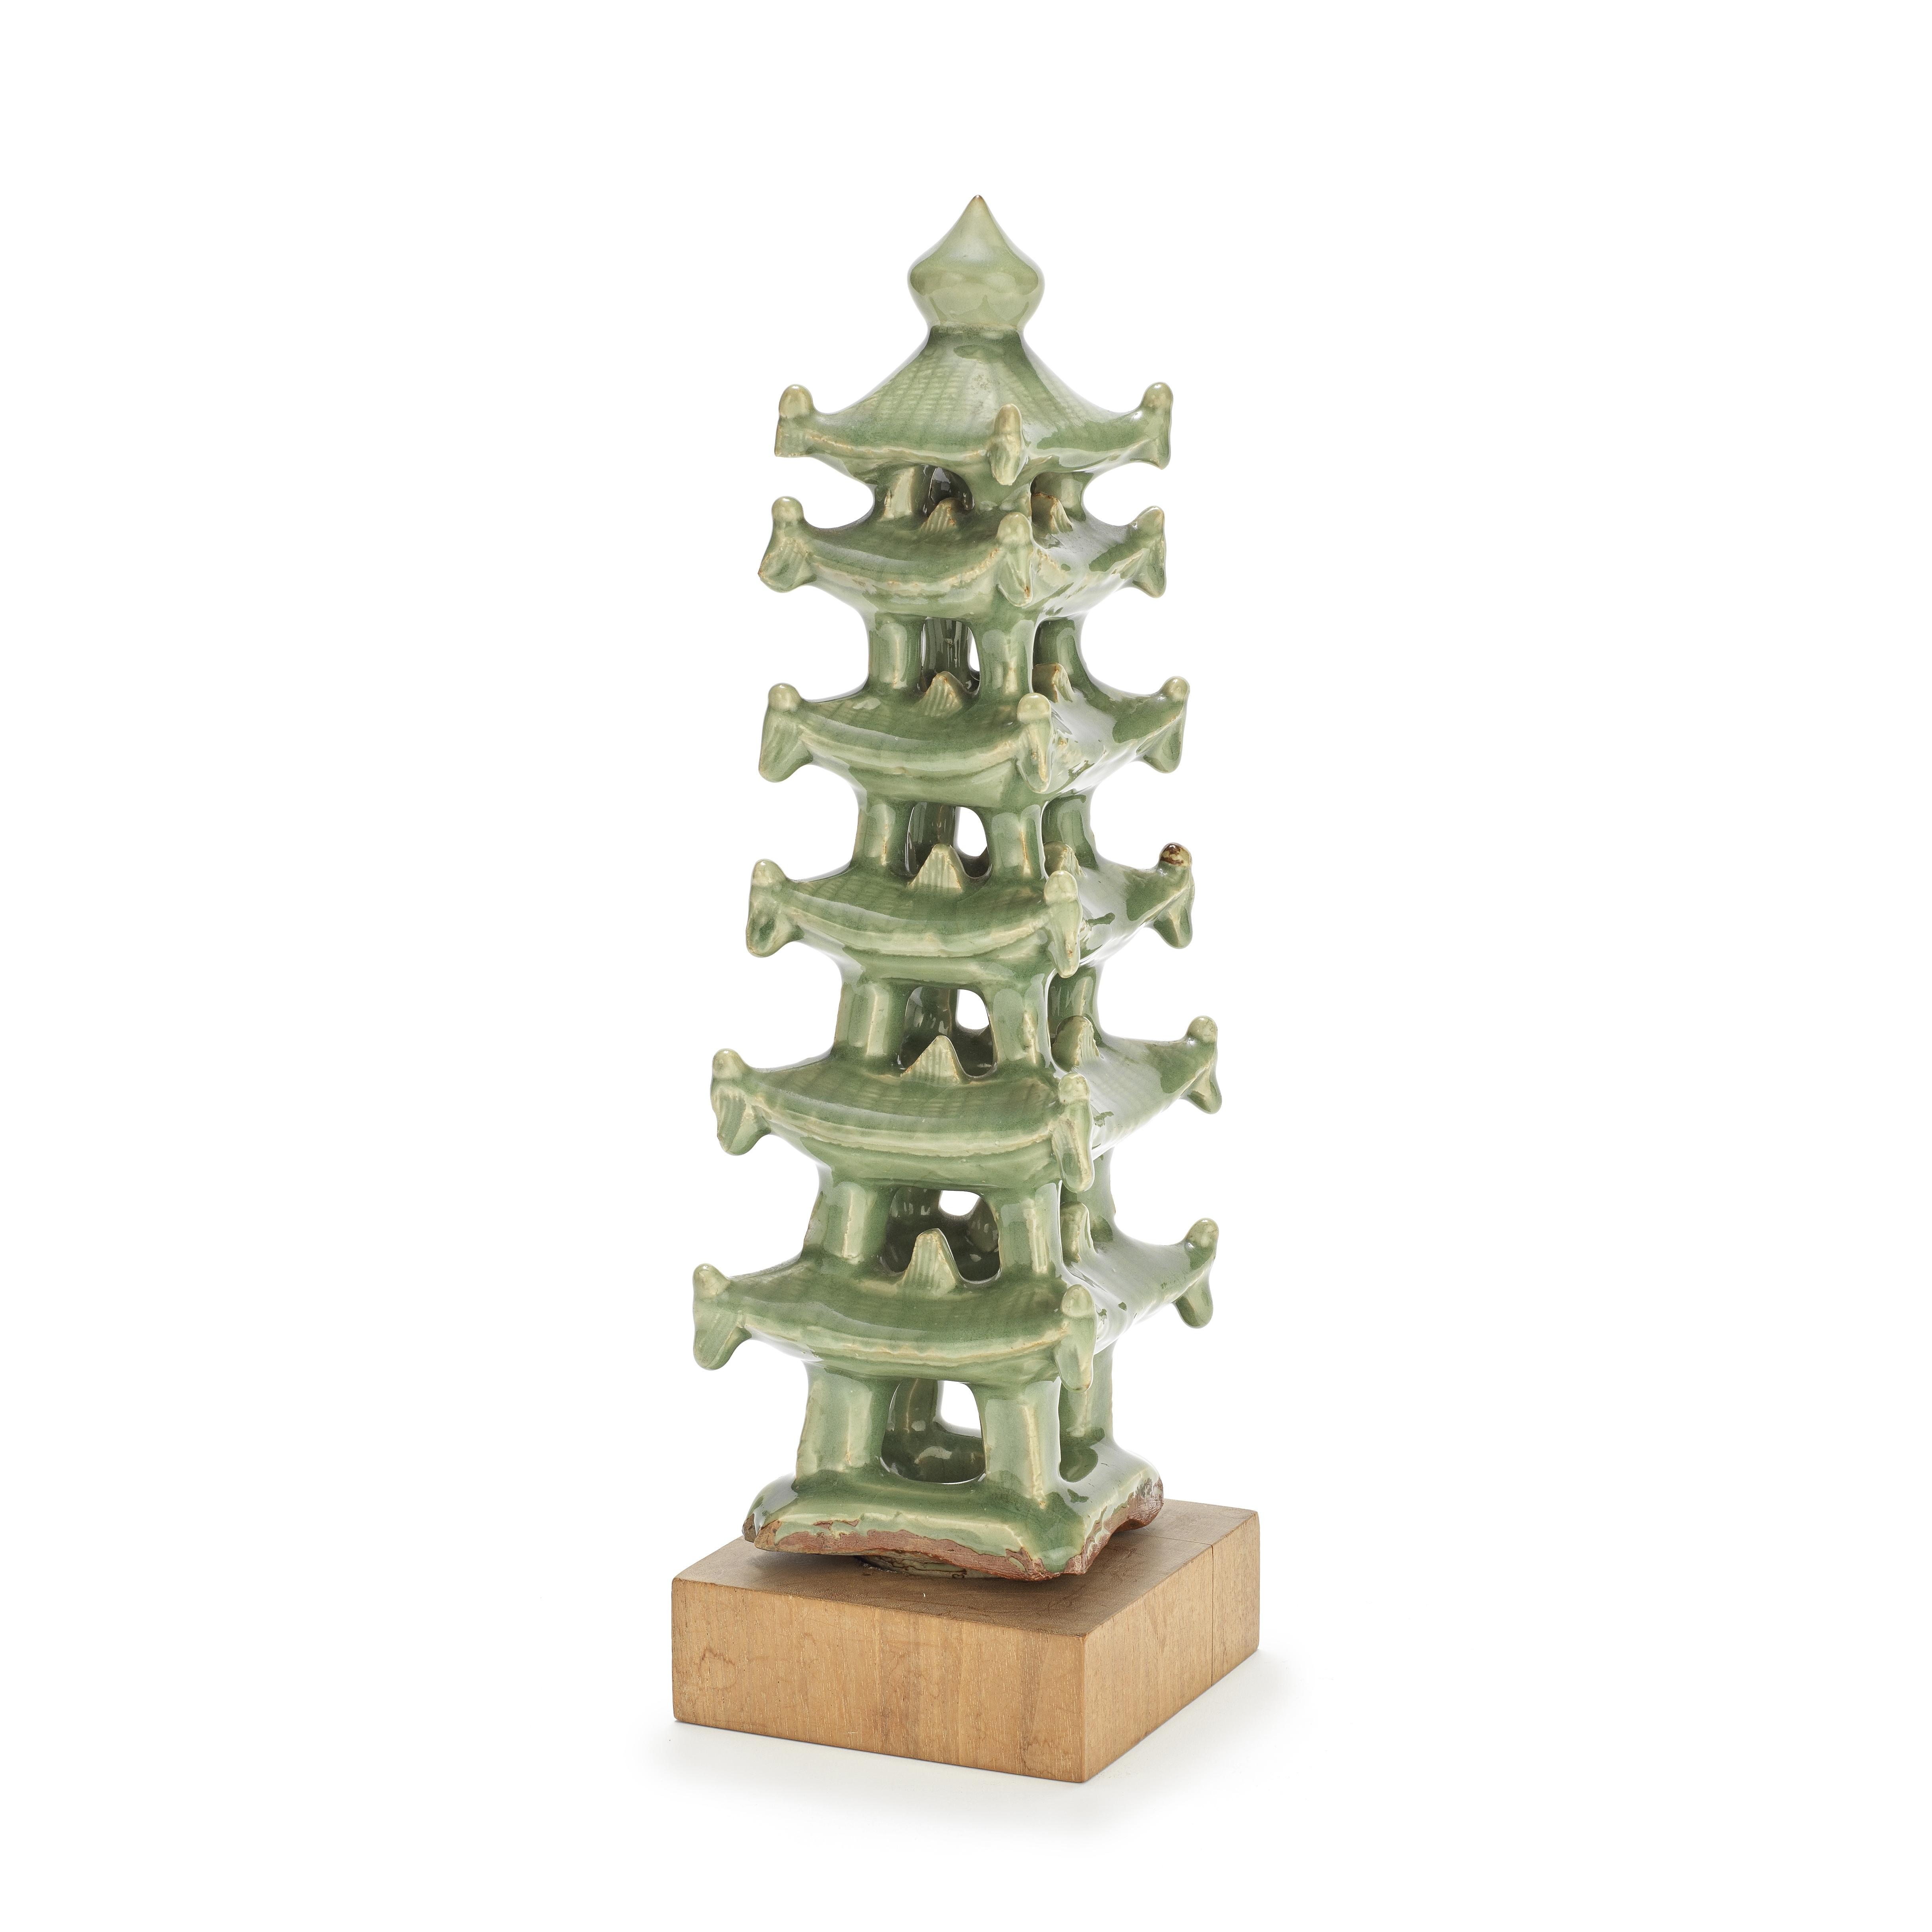 A CELADON-GLAZED PAGODA Ming Dynasty or later (3)